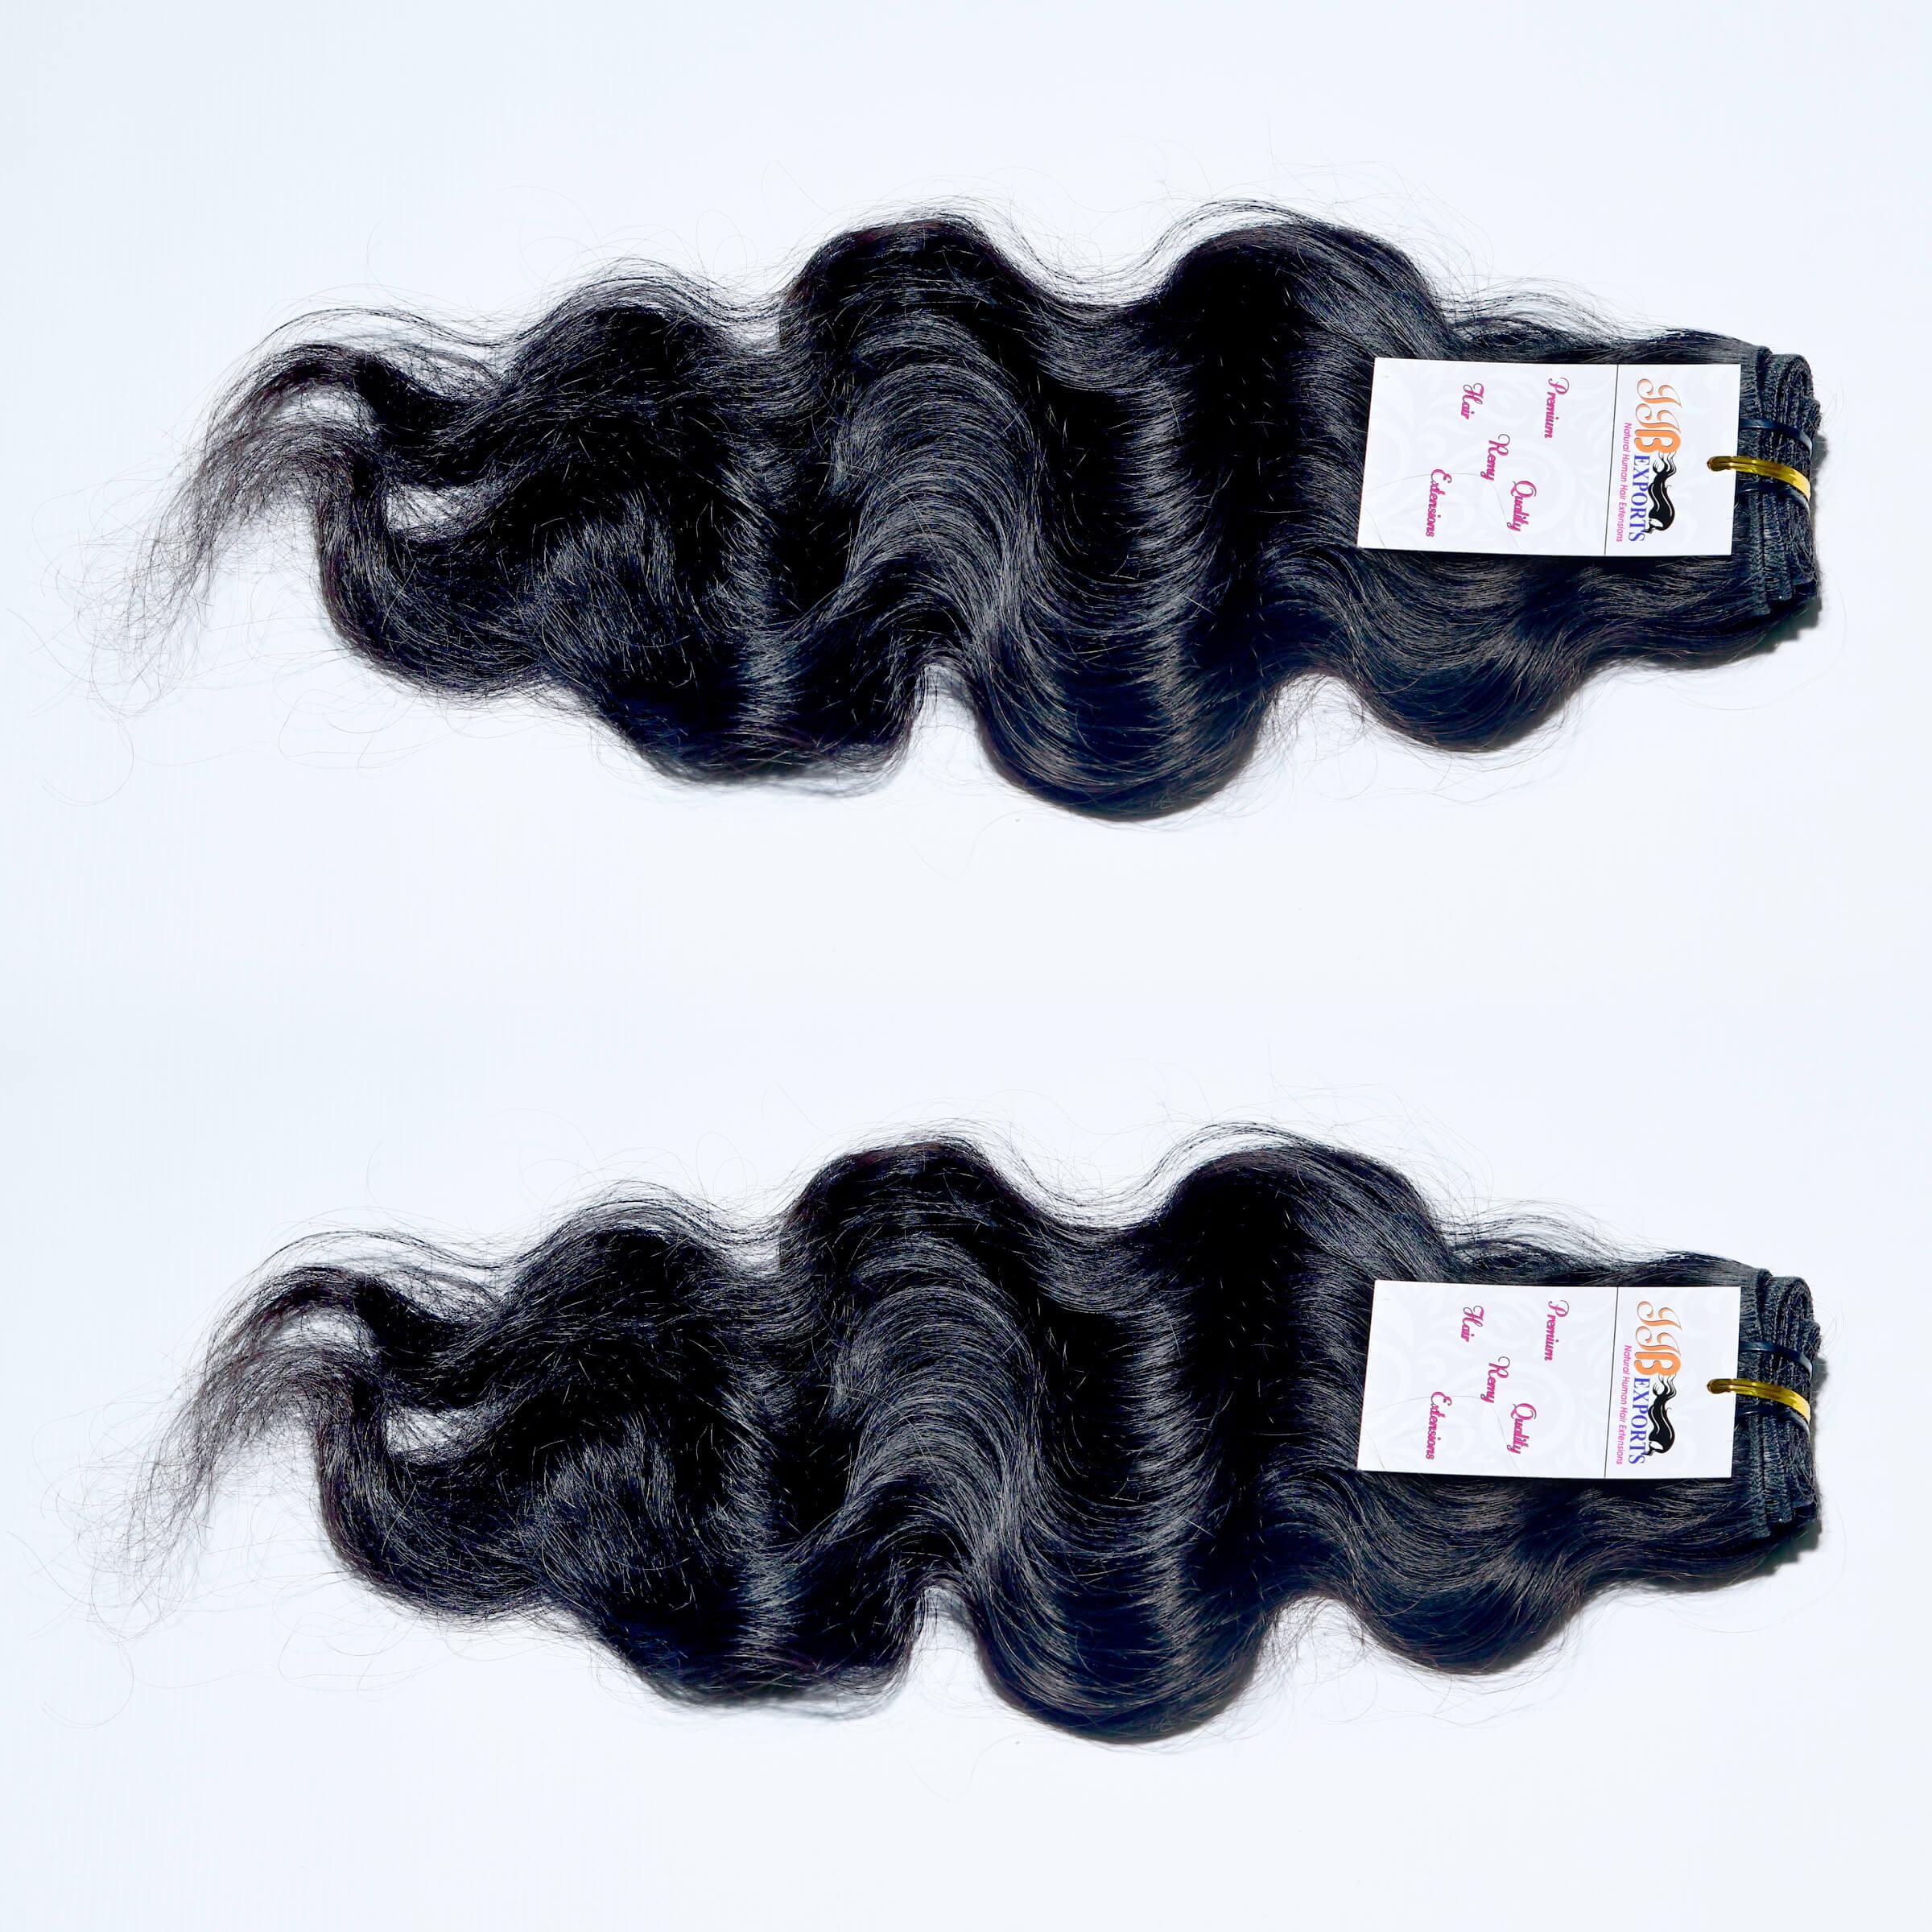 Natural Virgin Wavy Black Women Hair Curly Human Hair Bundles,virgin Hair Bundles